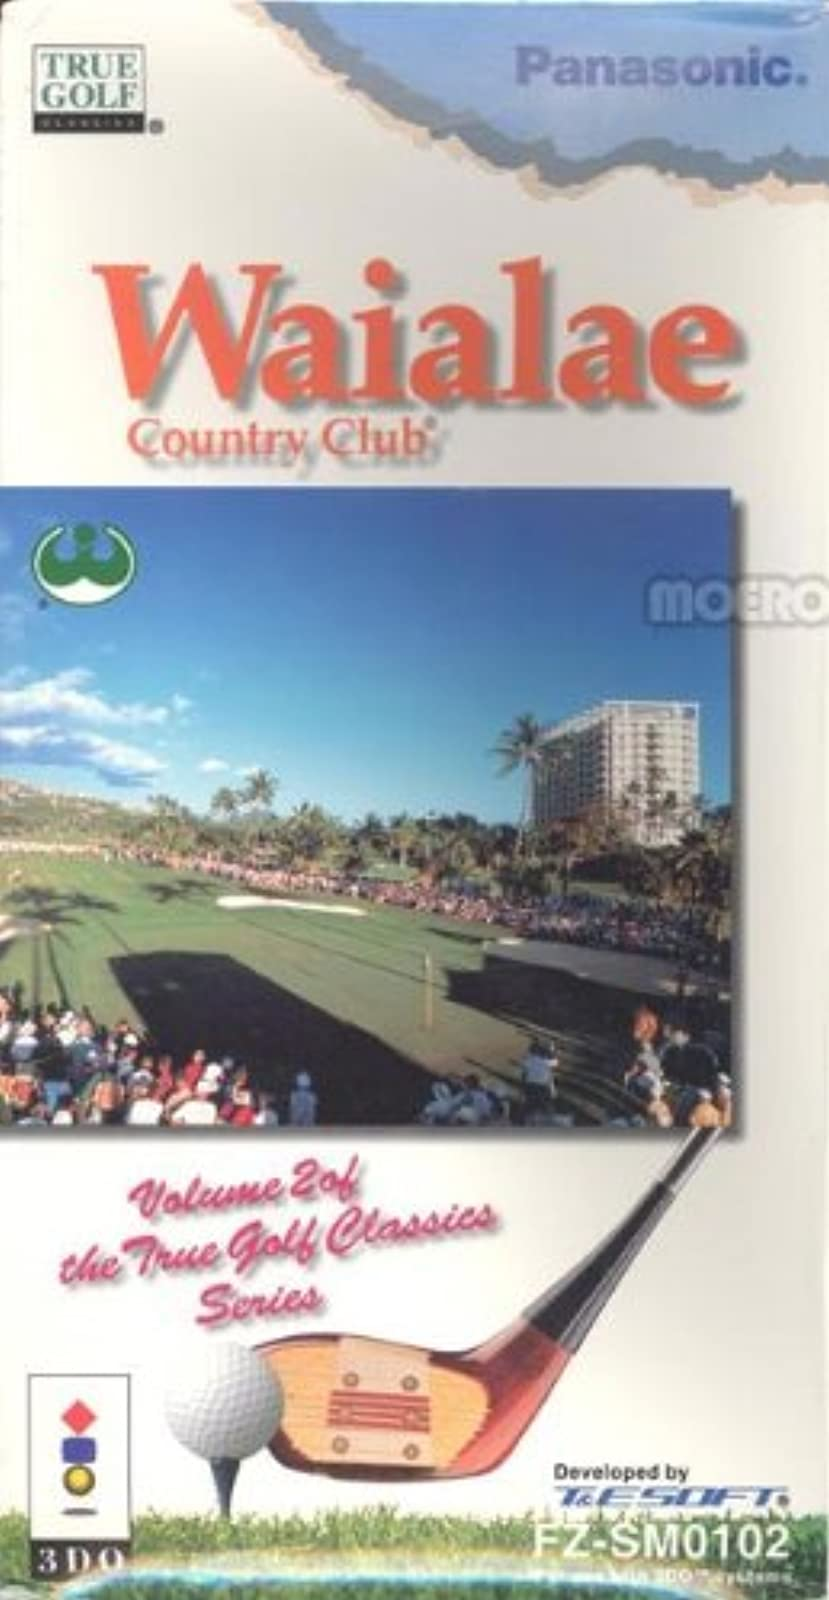 Waialae Country Club For 3DO